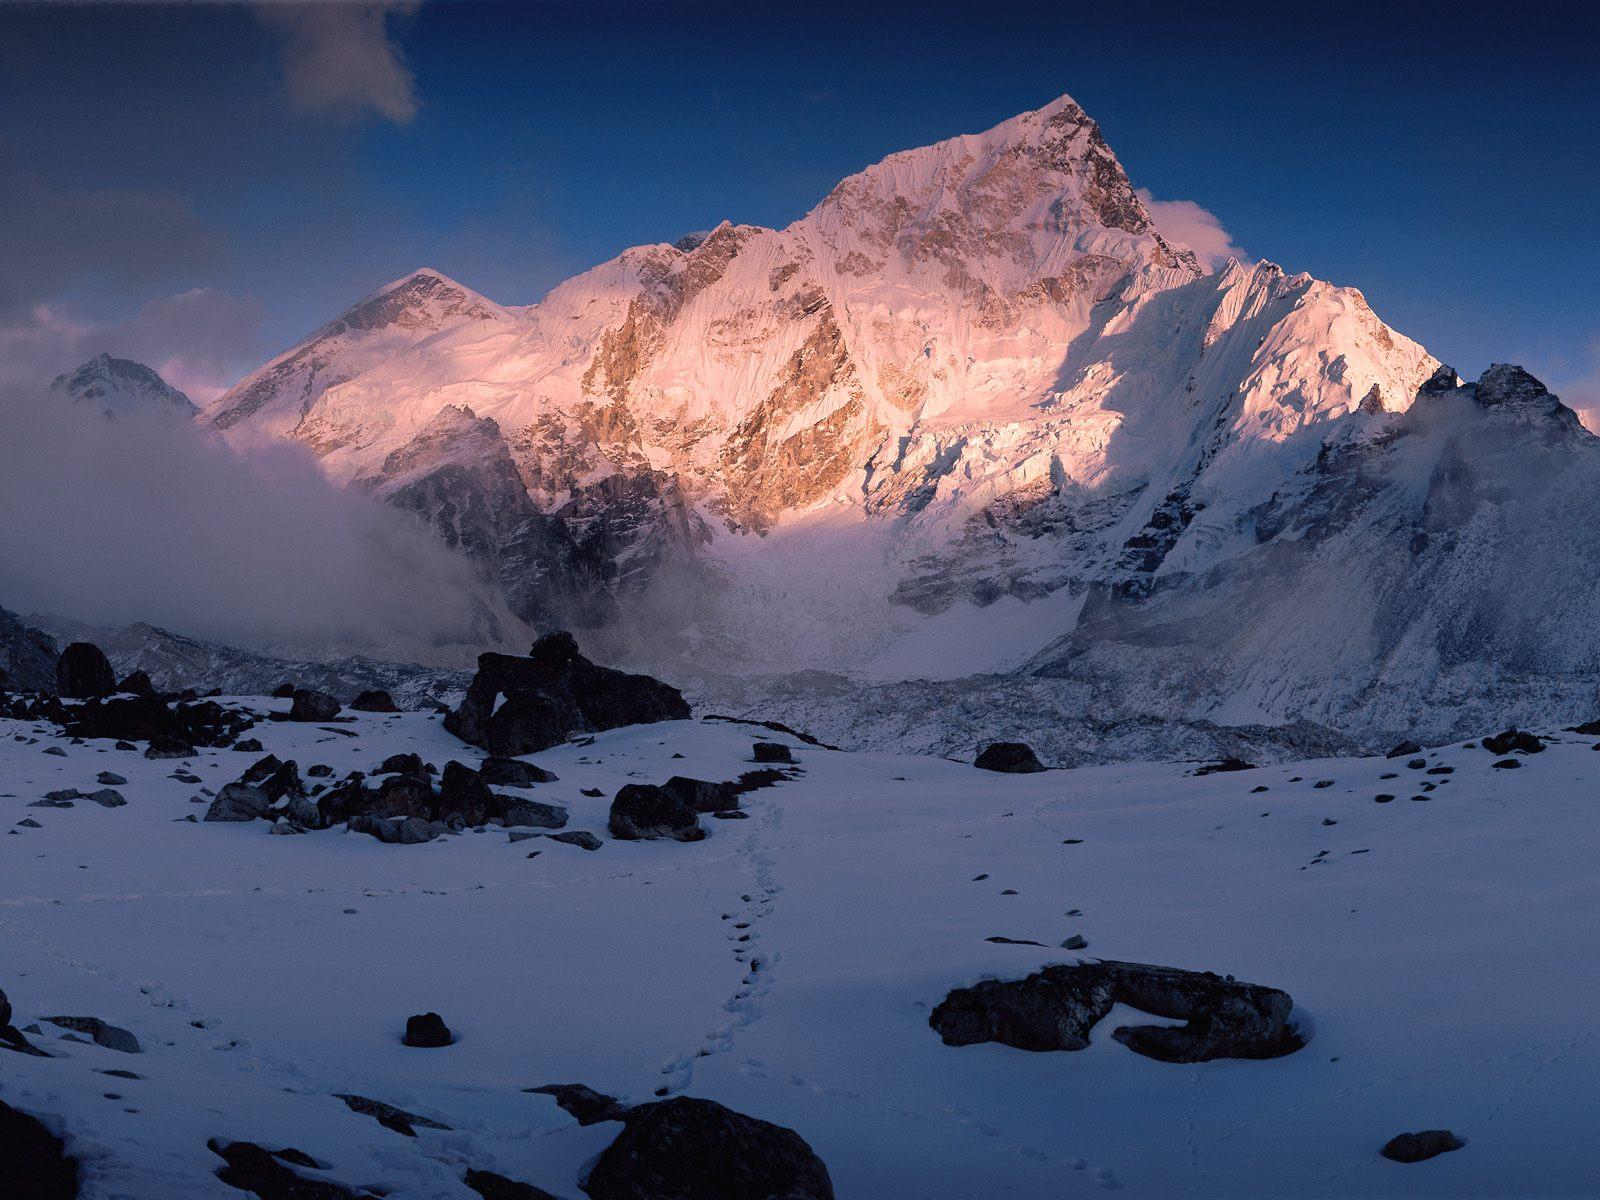 Description Himalaya Mountains Nepal Wallpaper is a hi res Wallpaper 1600x1200